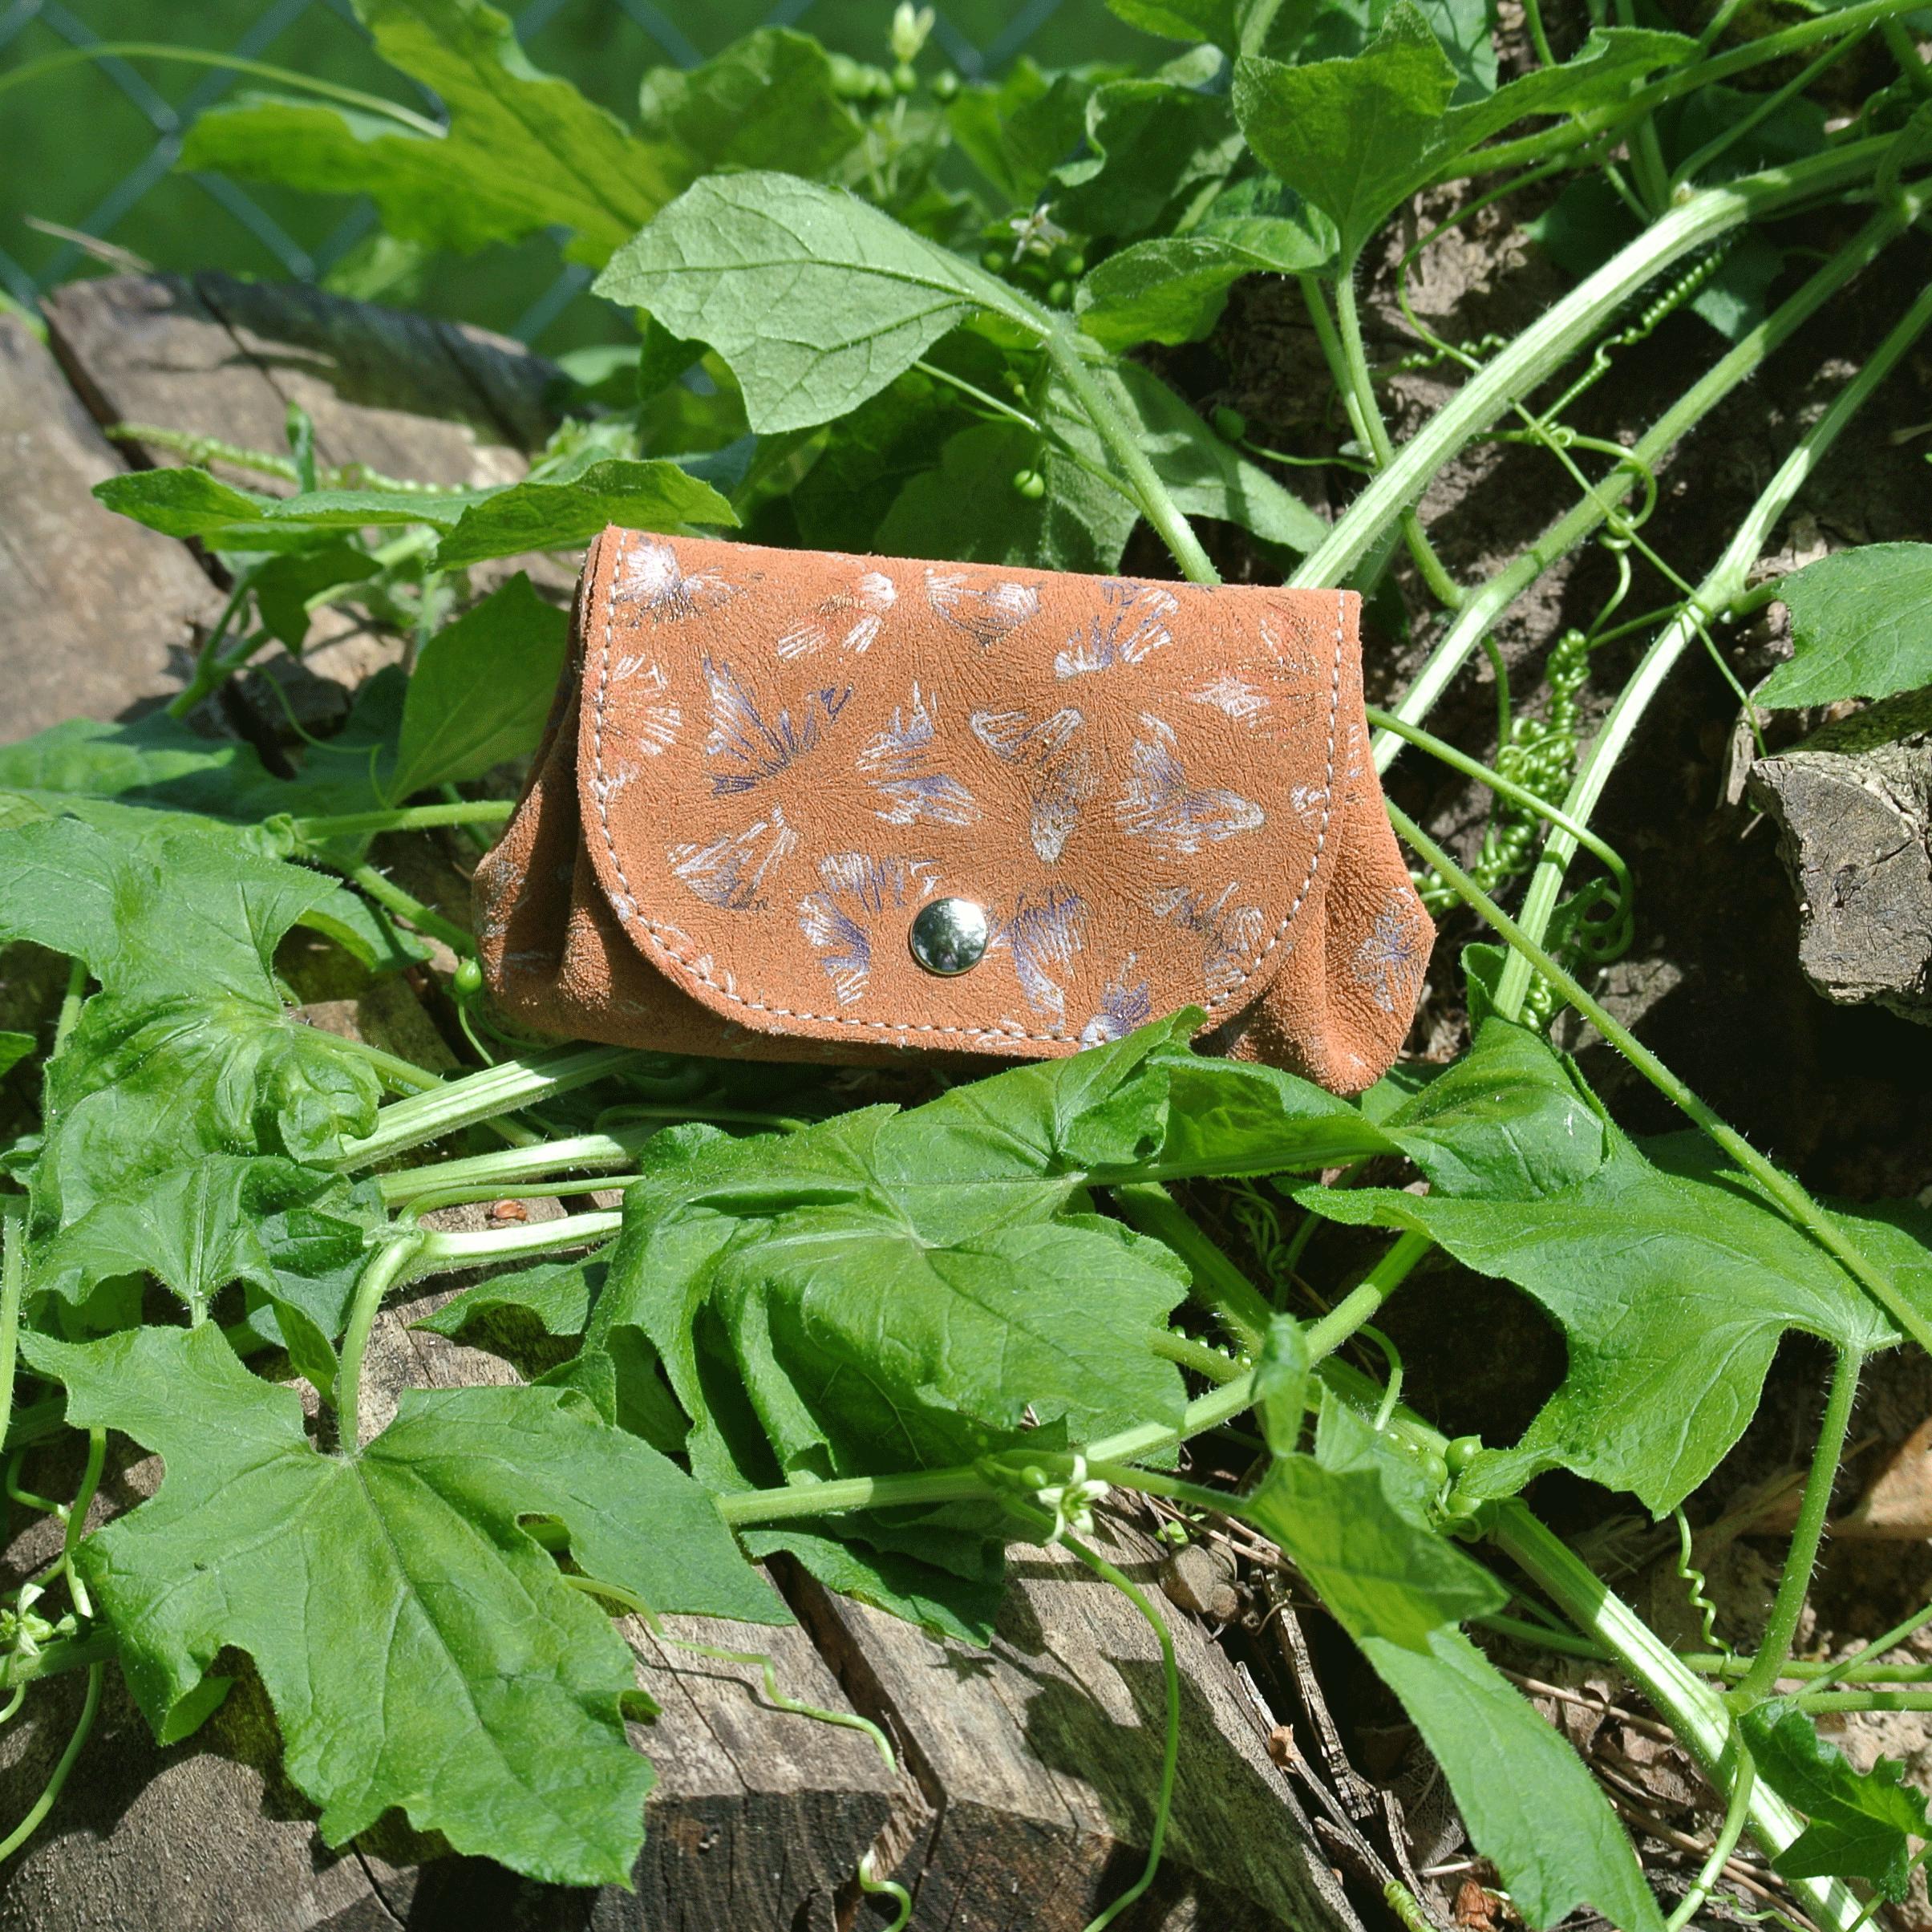 cuirs-fantaisie-la-cartabliere-fabrique-en-france-porte-monnaie-accordeon-en-cuir-floralie-caramel